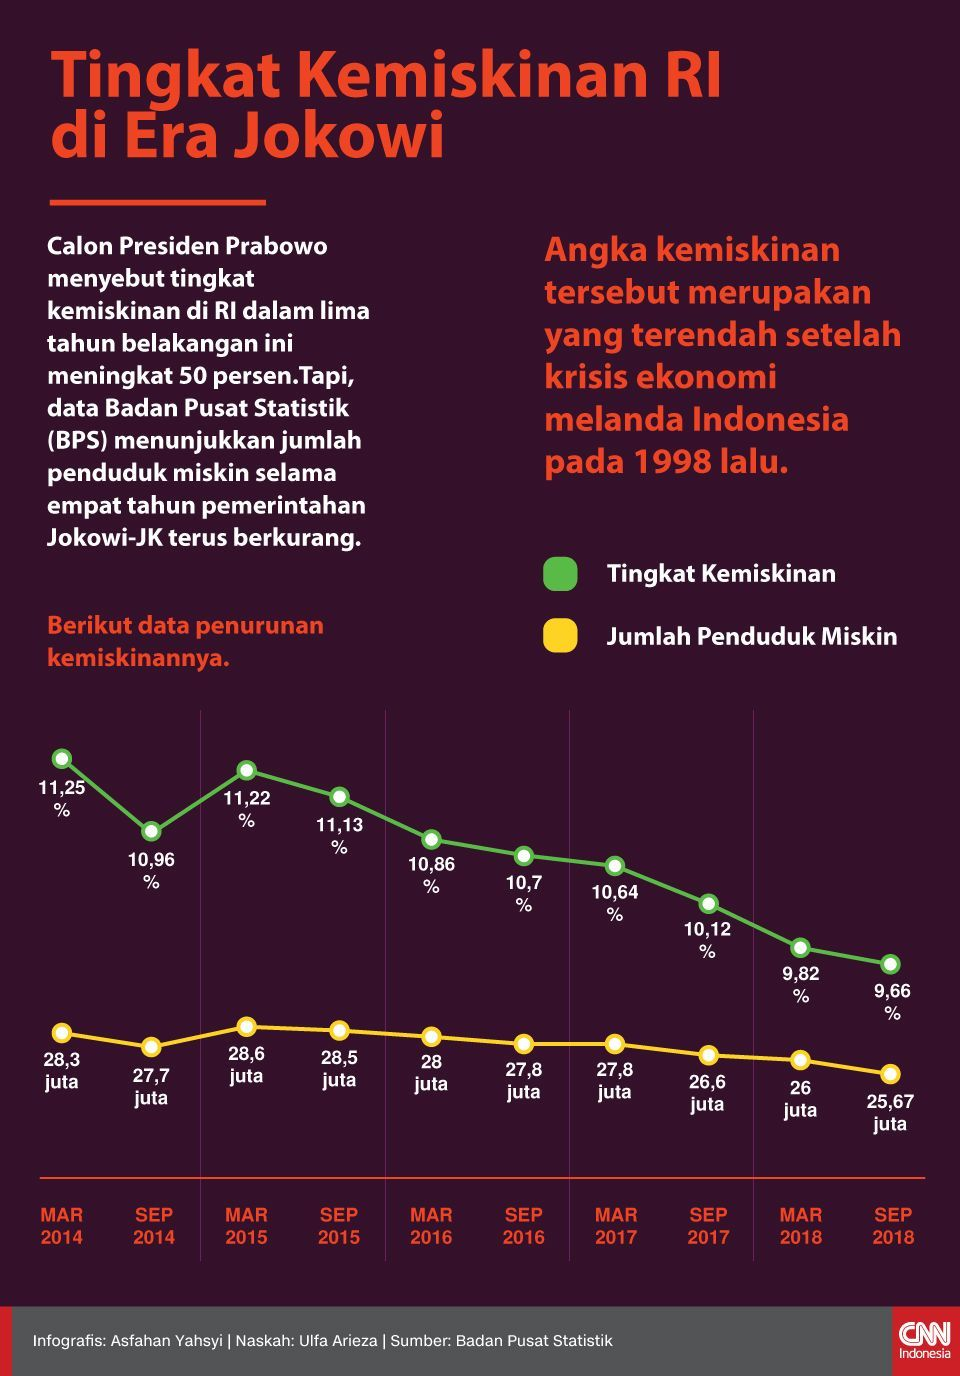 Infografis Tingkat Kemiskinan RI di Era Jokowi